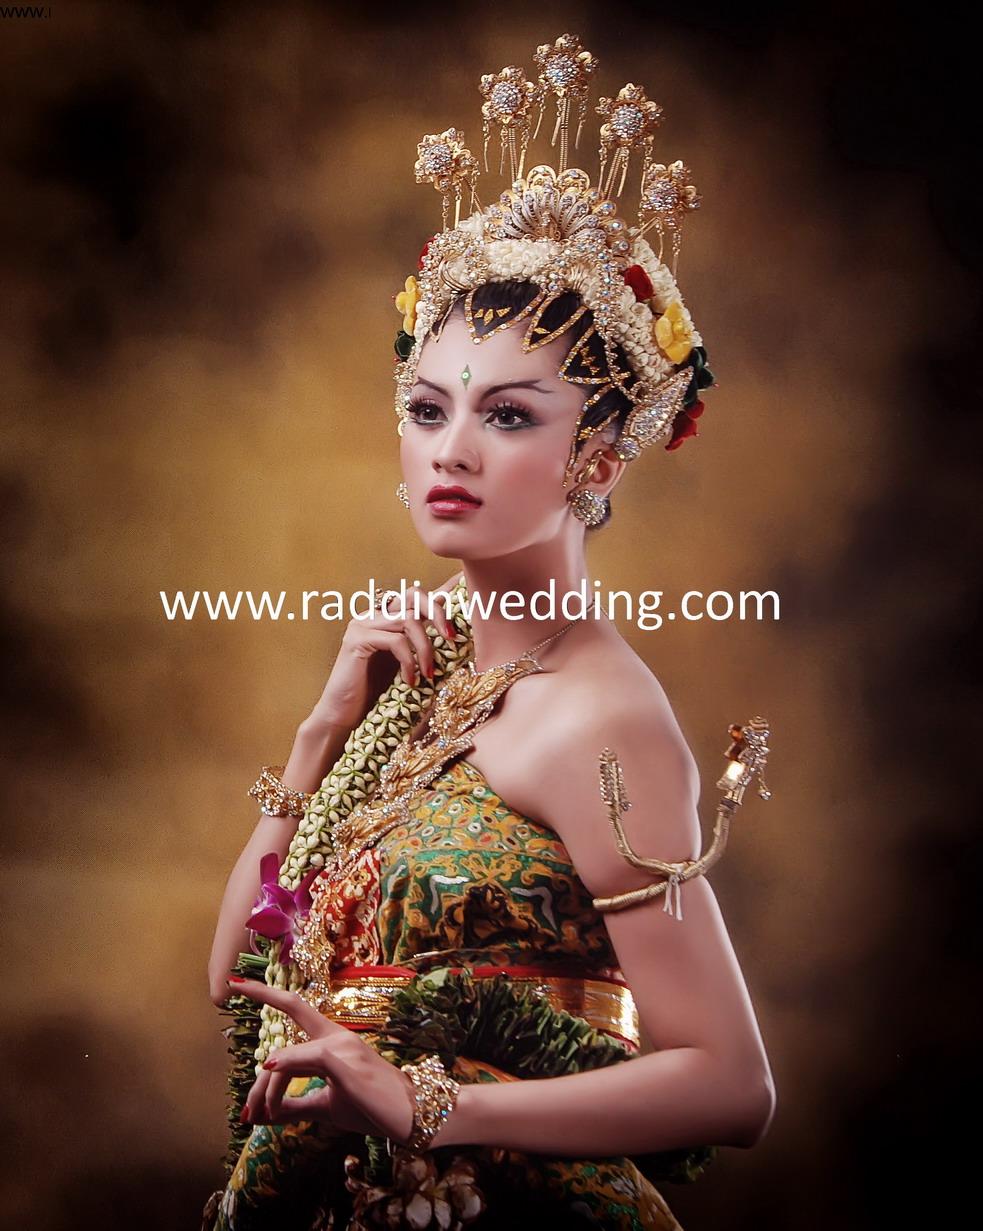 8 1 bdf95b31de4e739ee0bb0f9e51935306 jpg Source · Tradisional Wedding by Raddin Wedding Bridestory com